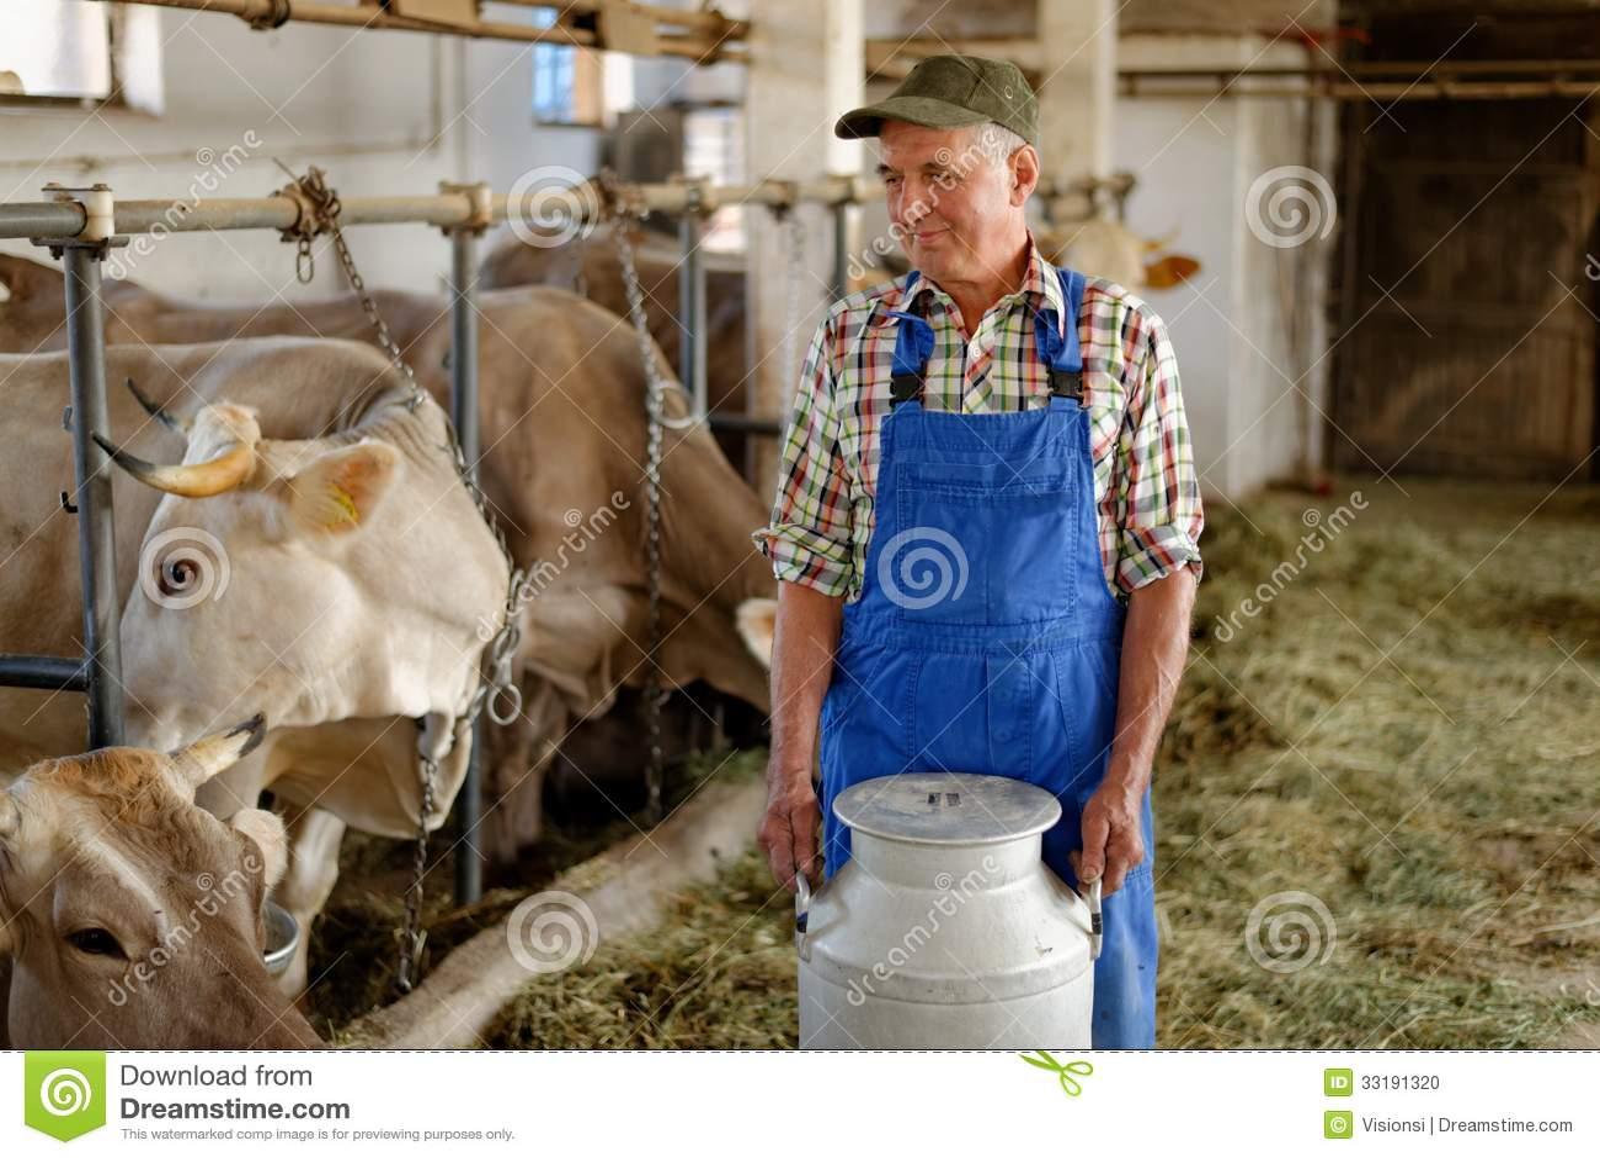 Farmer Is Working On The Organic Farm Stock Photo Image